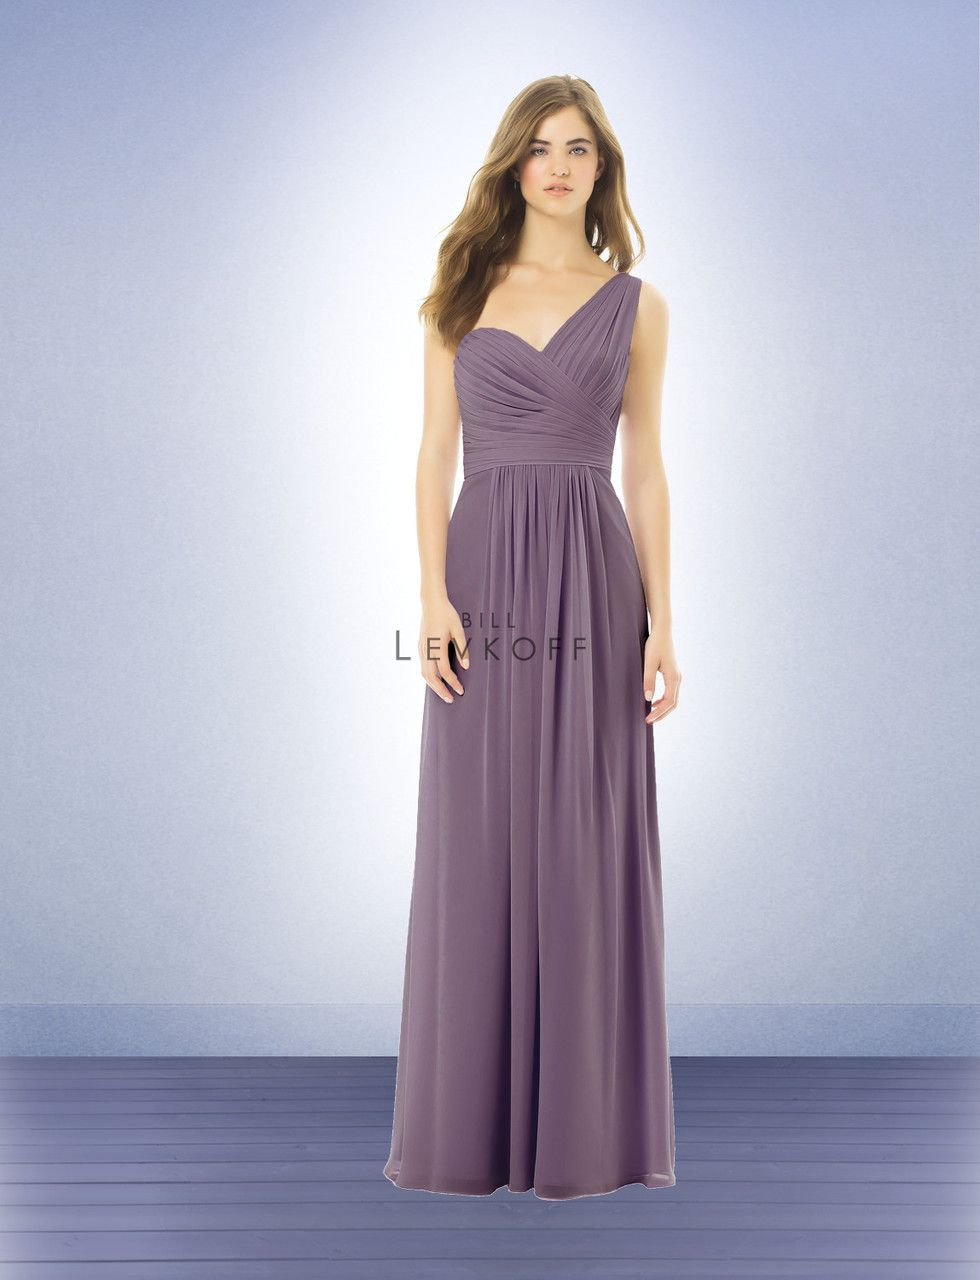 Bill levkoff 492 bill levkoff bridesmaid bridesmaid dress bill levkoff 492 lilac bridesmaid dresseswedding ombrellifo Images